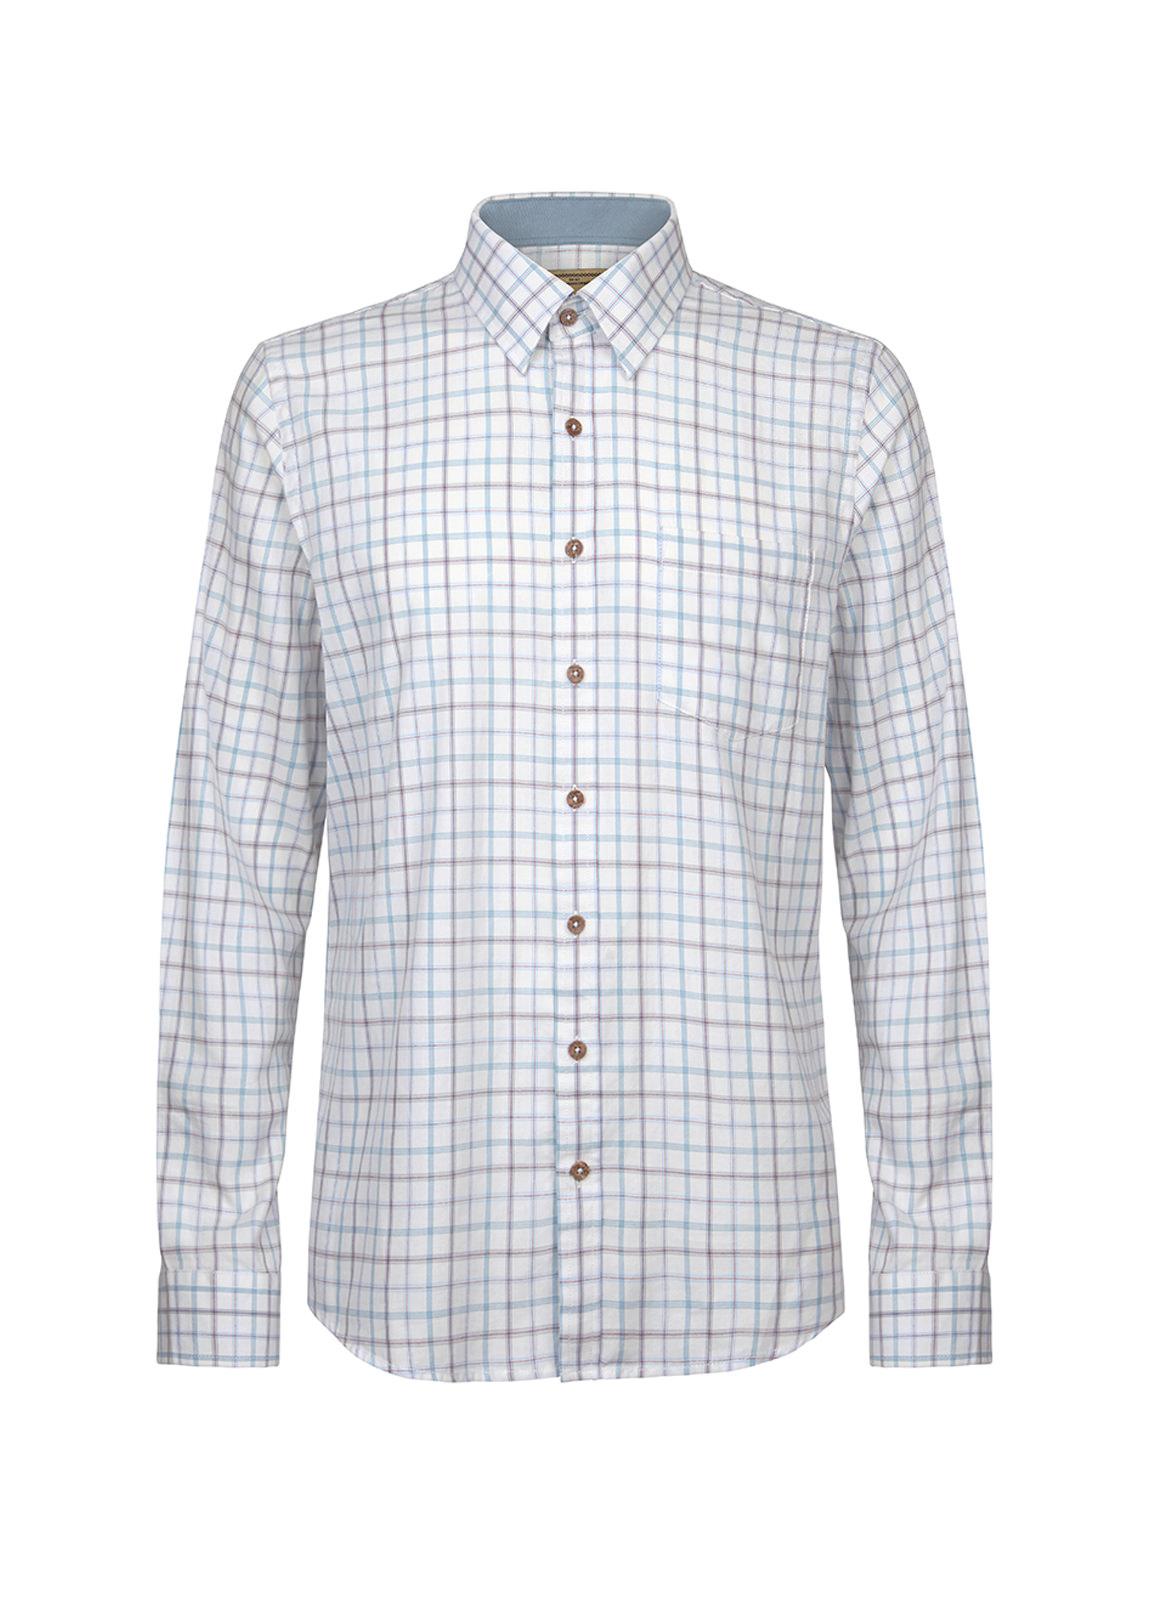 Dubarry_ Roundwood Men's Tattersall Check Shirt - Blue Multi_Image_2